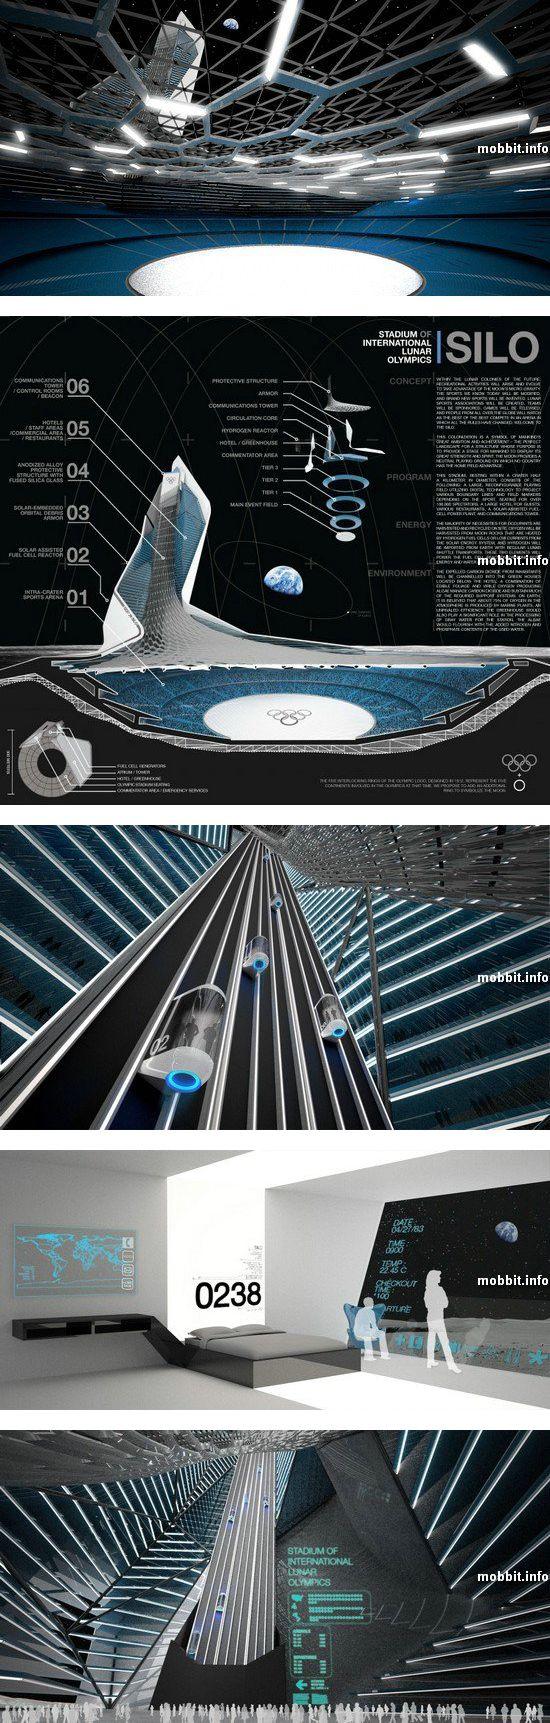 Cтадион для Лунных Олимпийских игр